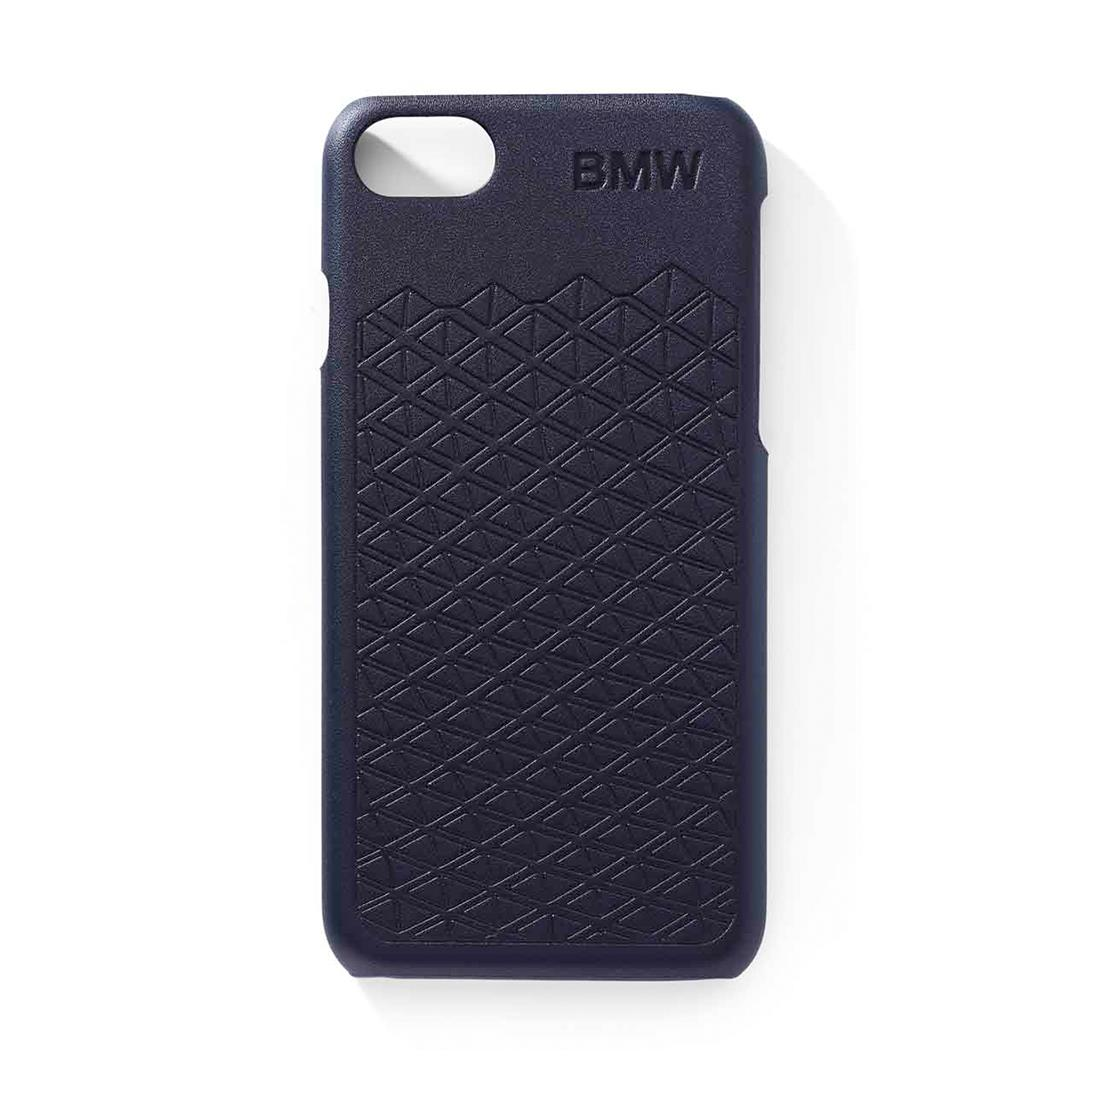 bmw iphone 8 case